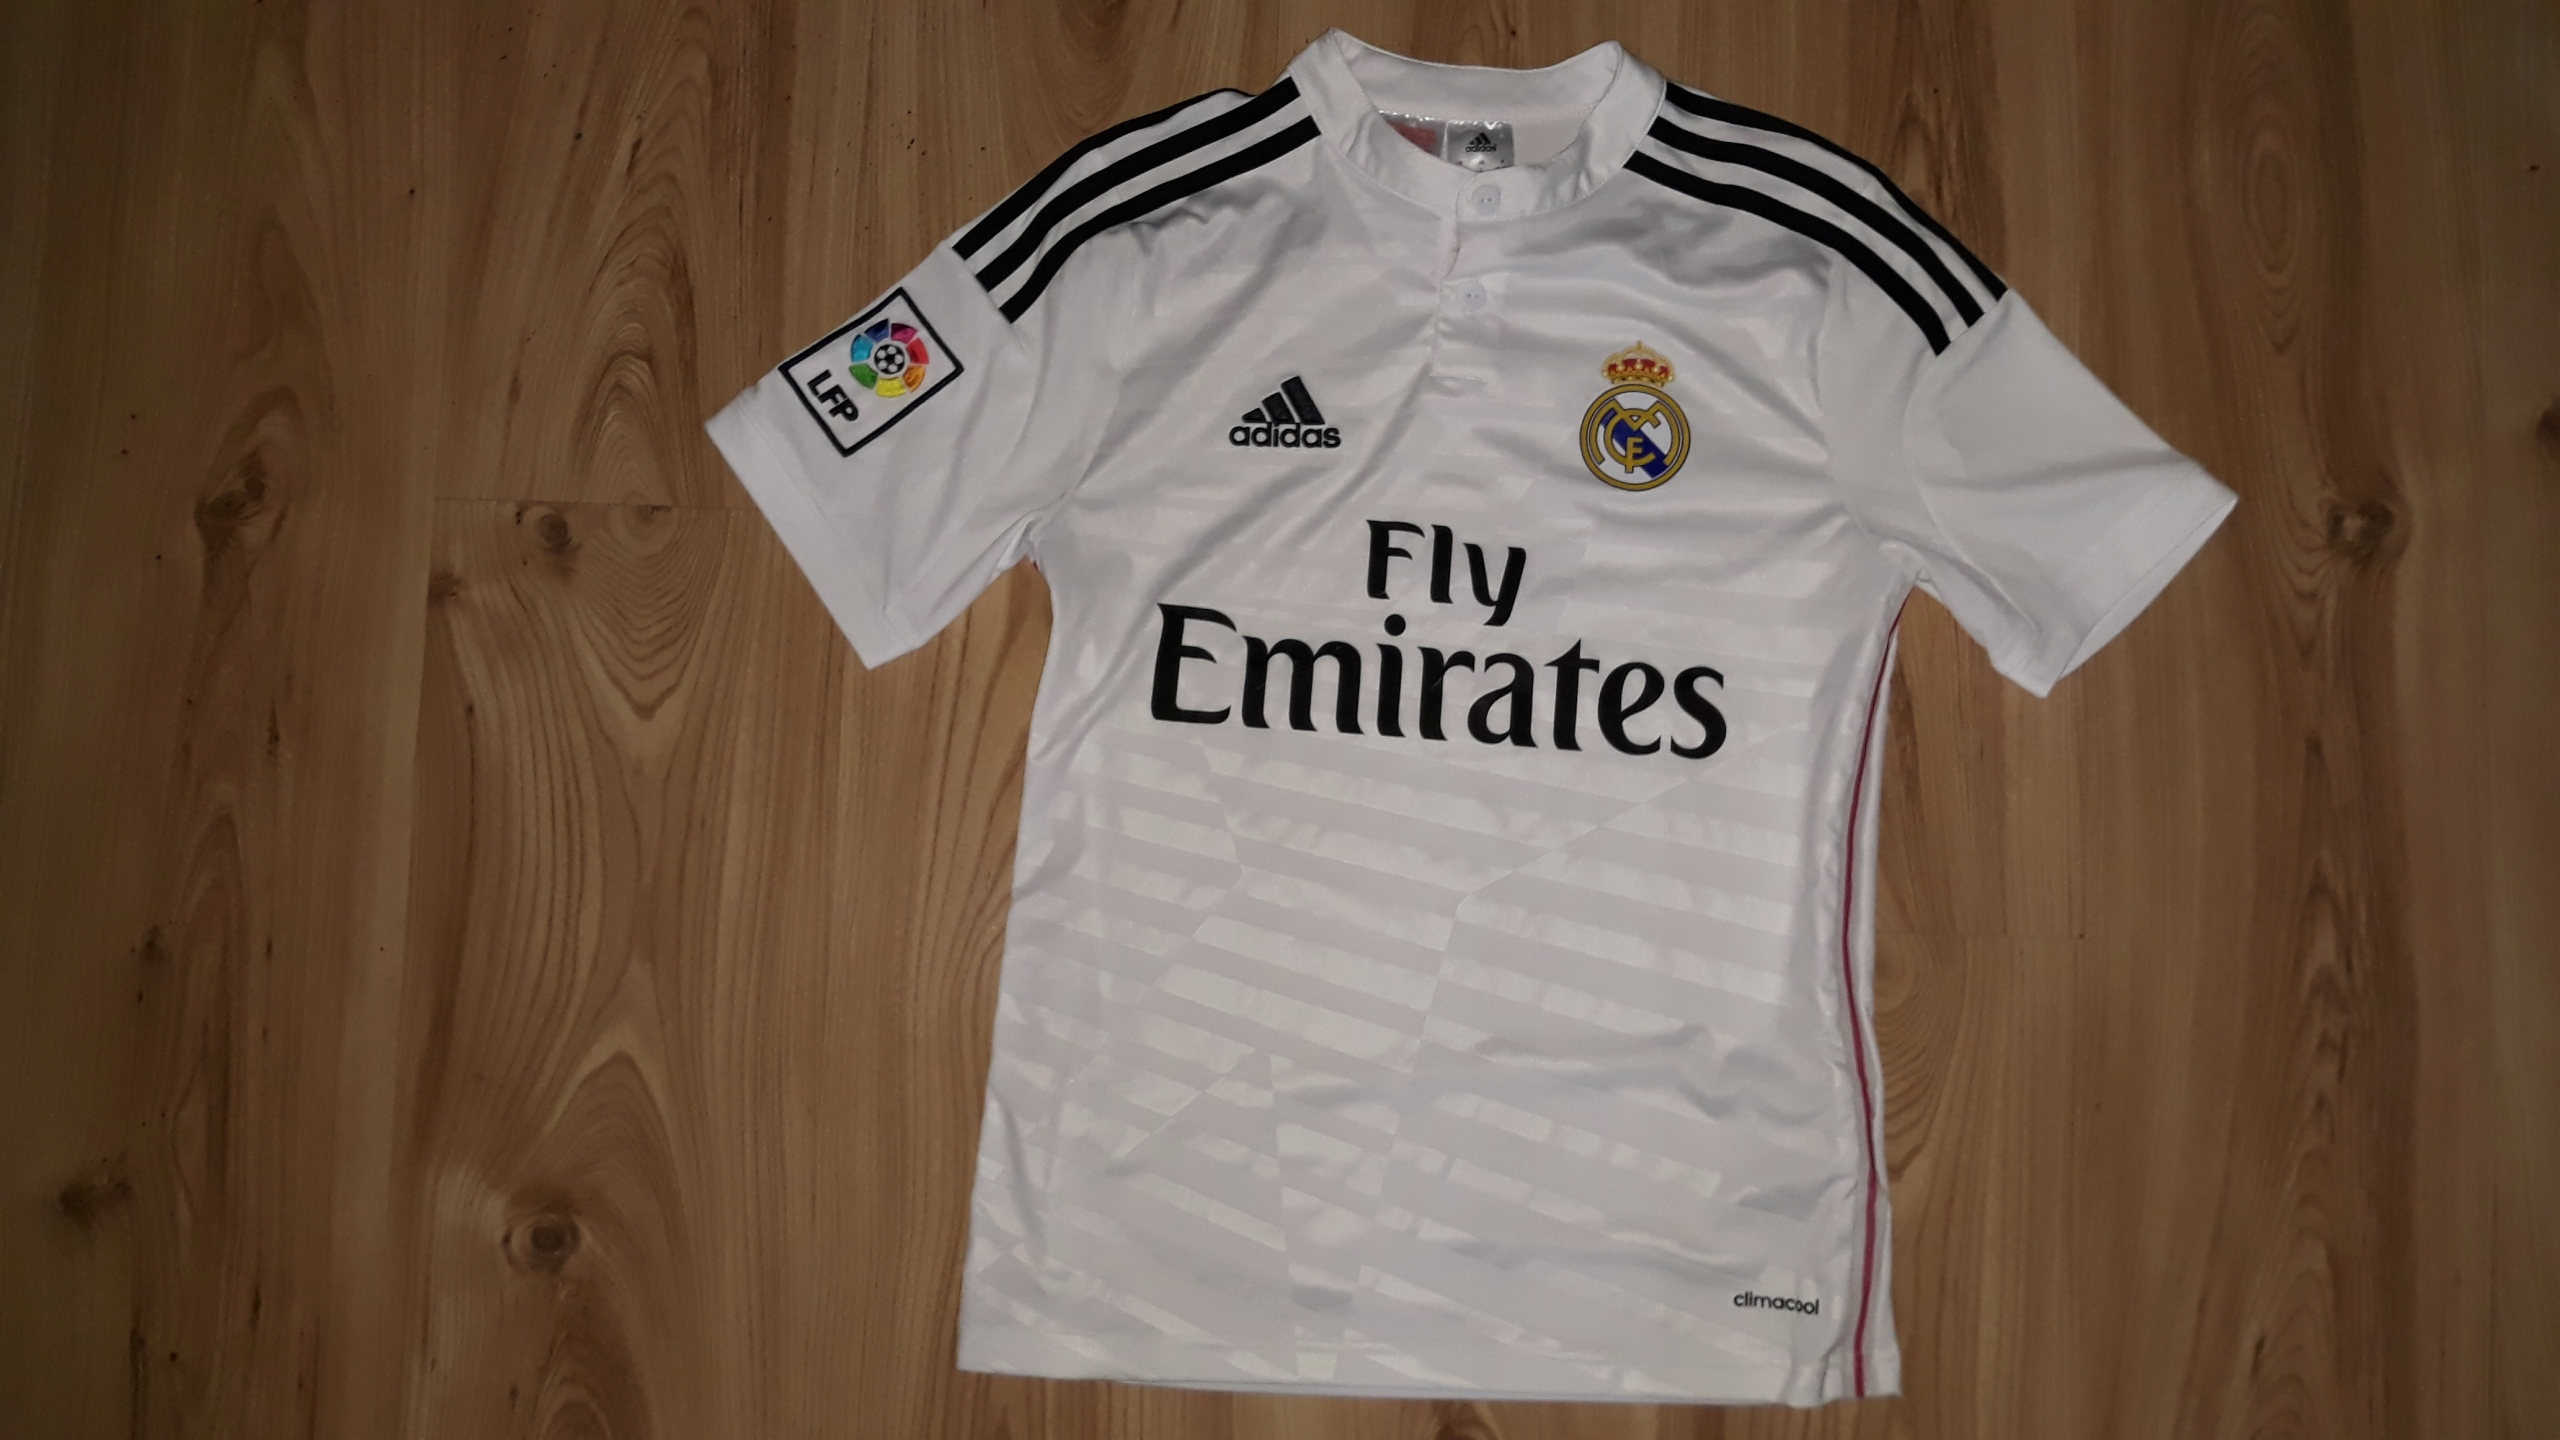 0d557f97b82bf2 Koszulka Adidas Real Madryt L 164 Fly Emirates - 7661528790 - oficjalne  archiwum allegro